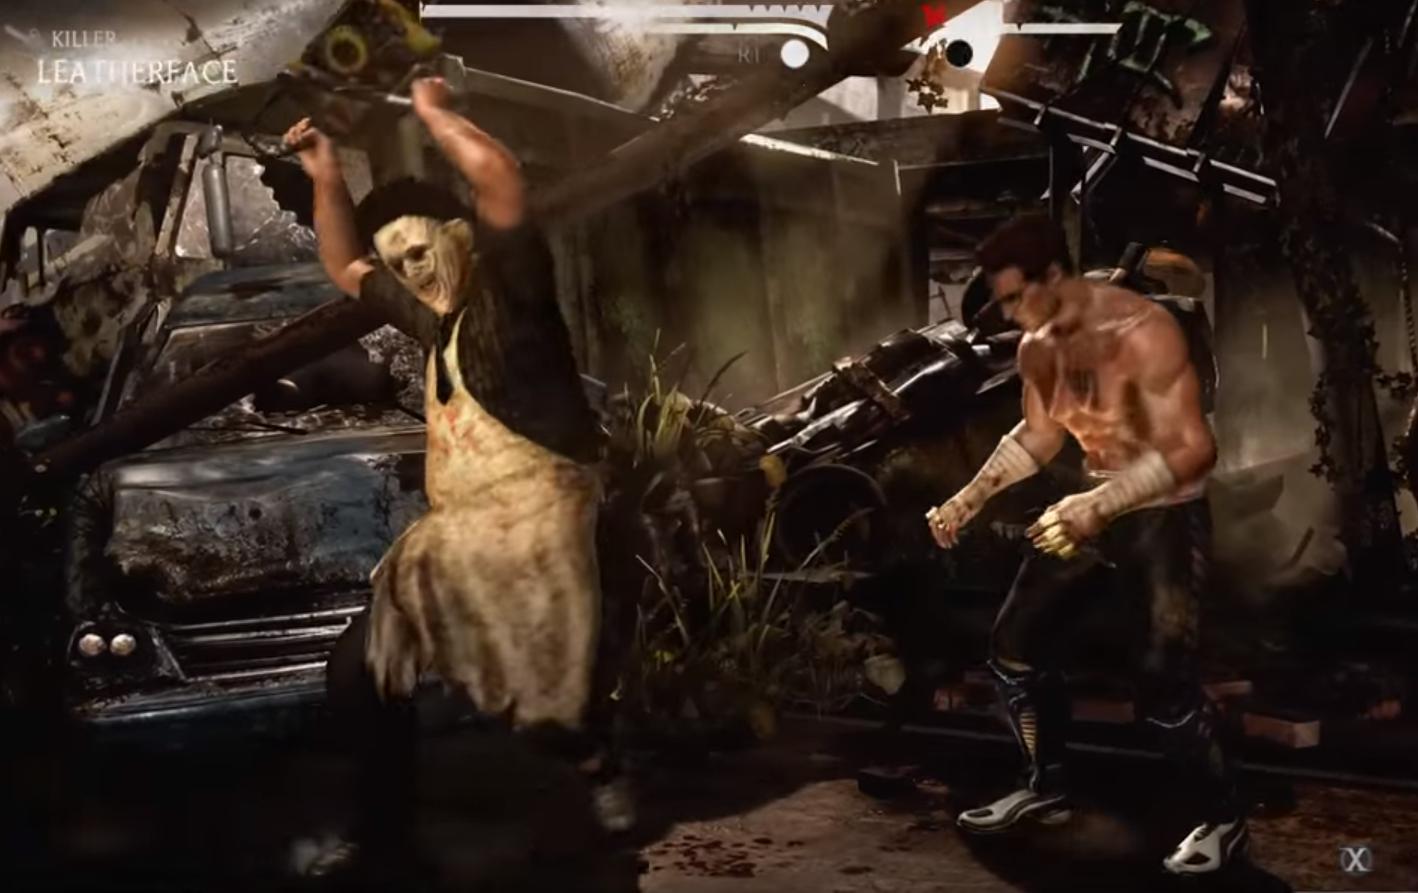 Las sangrientas fatalities de Leatherface y Alien en Mortal Kombat X